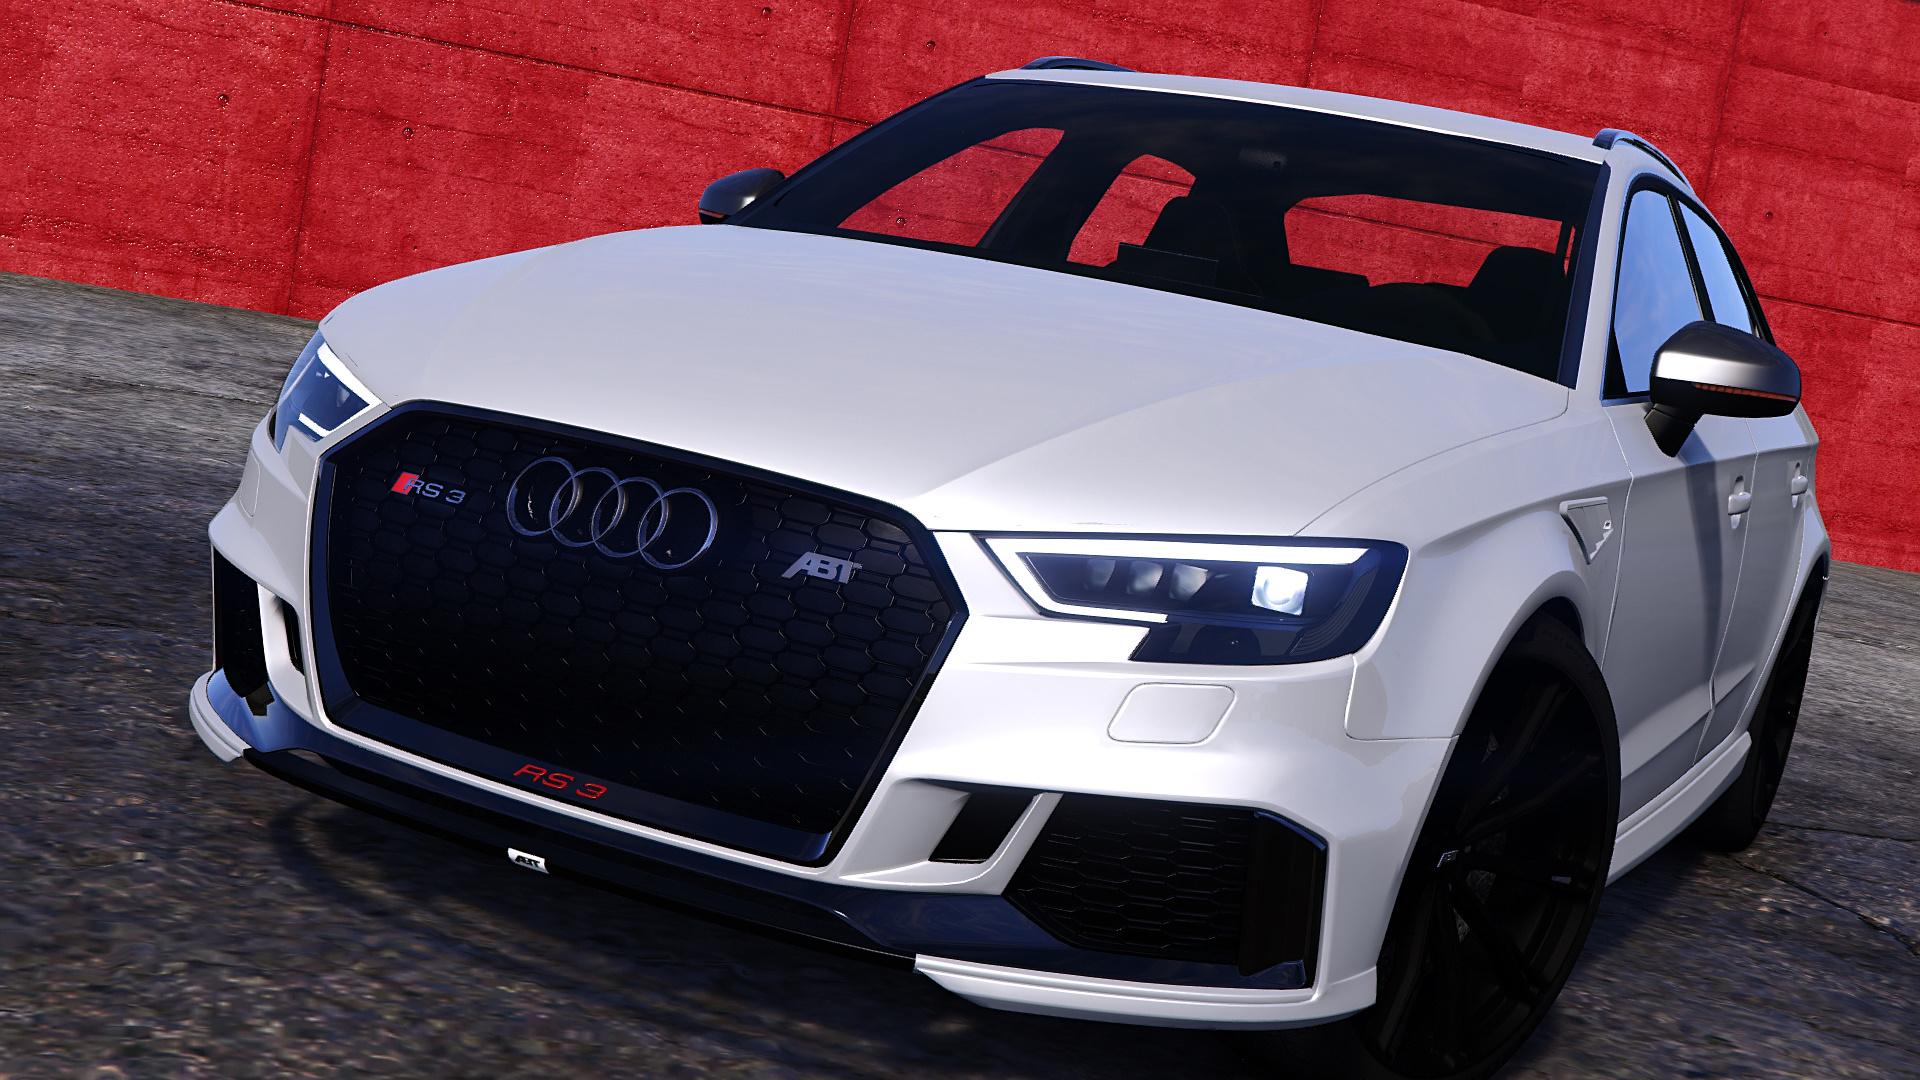 Audi Rs3 Sportback 2018 Add On Tuning Abt Gta5 Mods Com